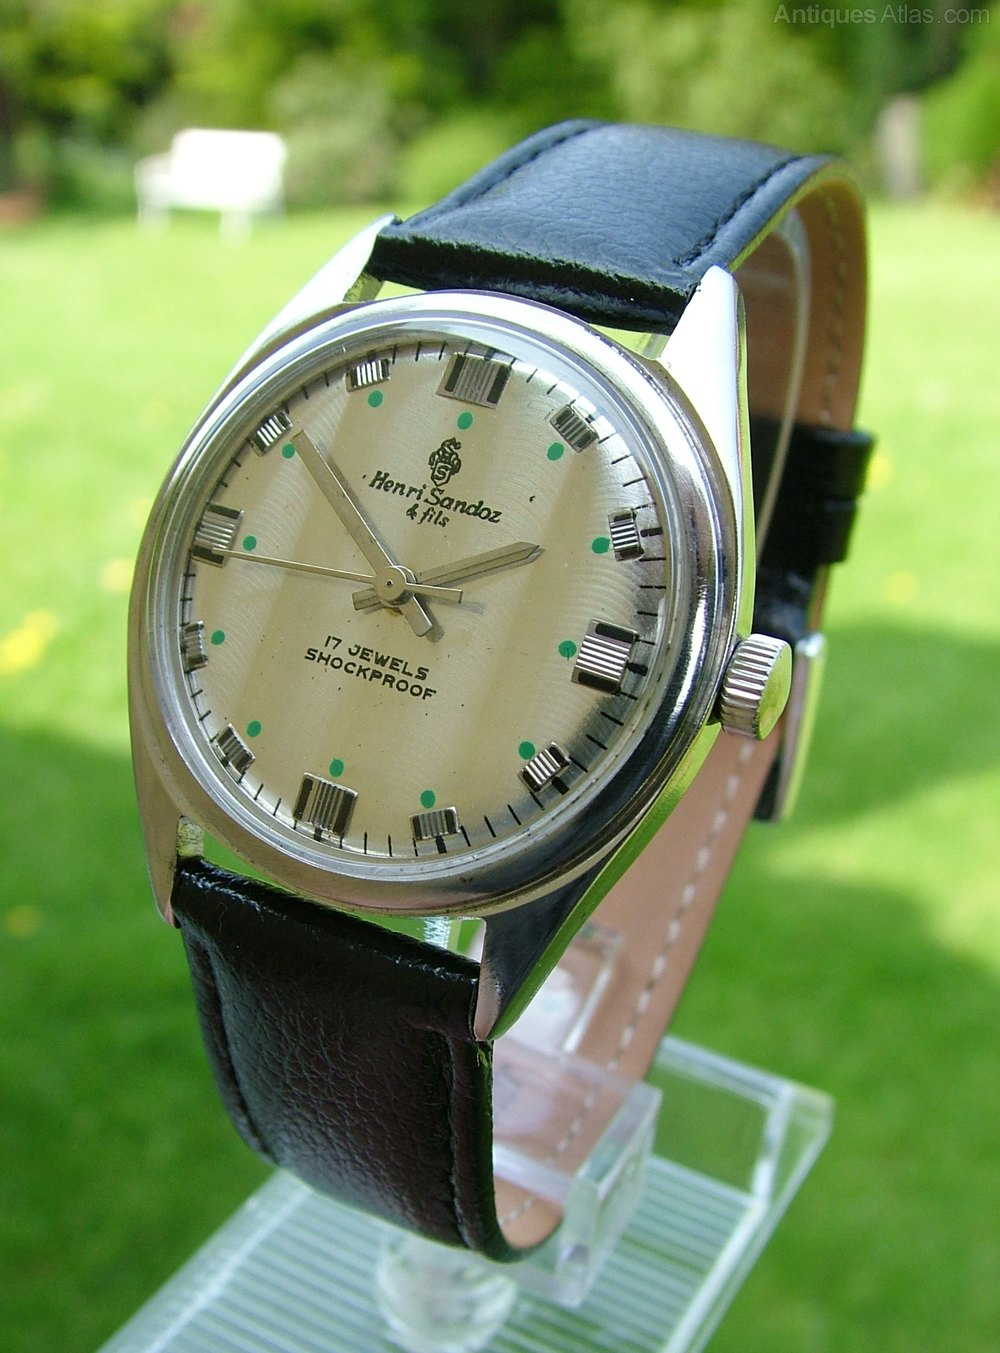 Antiques Atlas - A 1950 Mid-size Bulova Wrist Watch